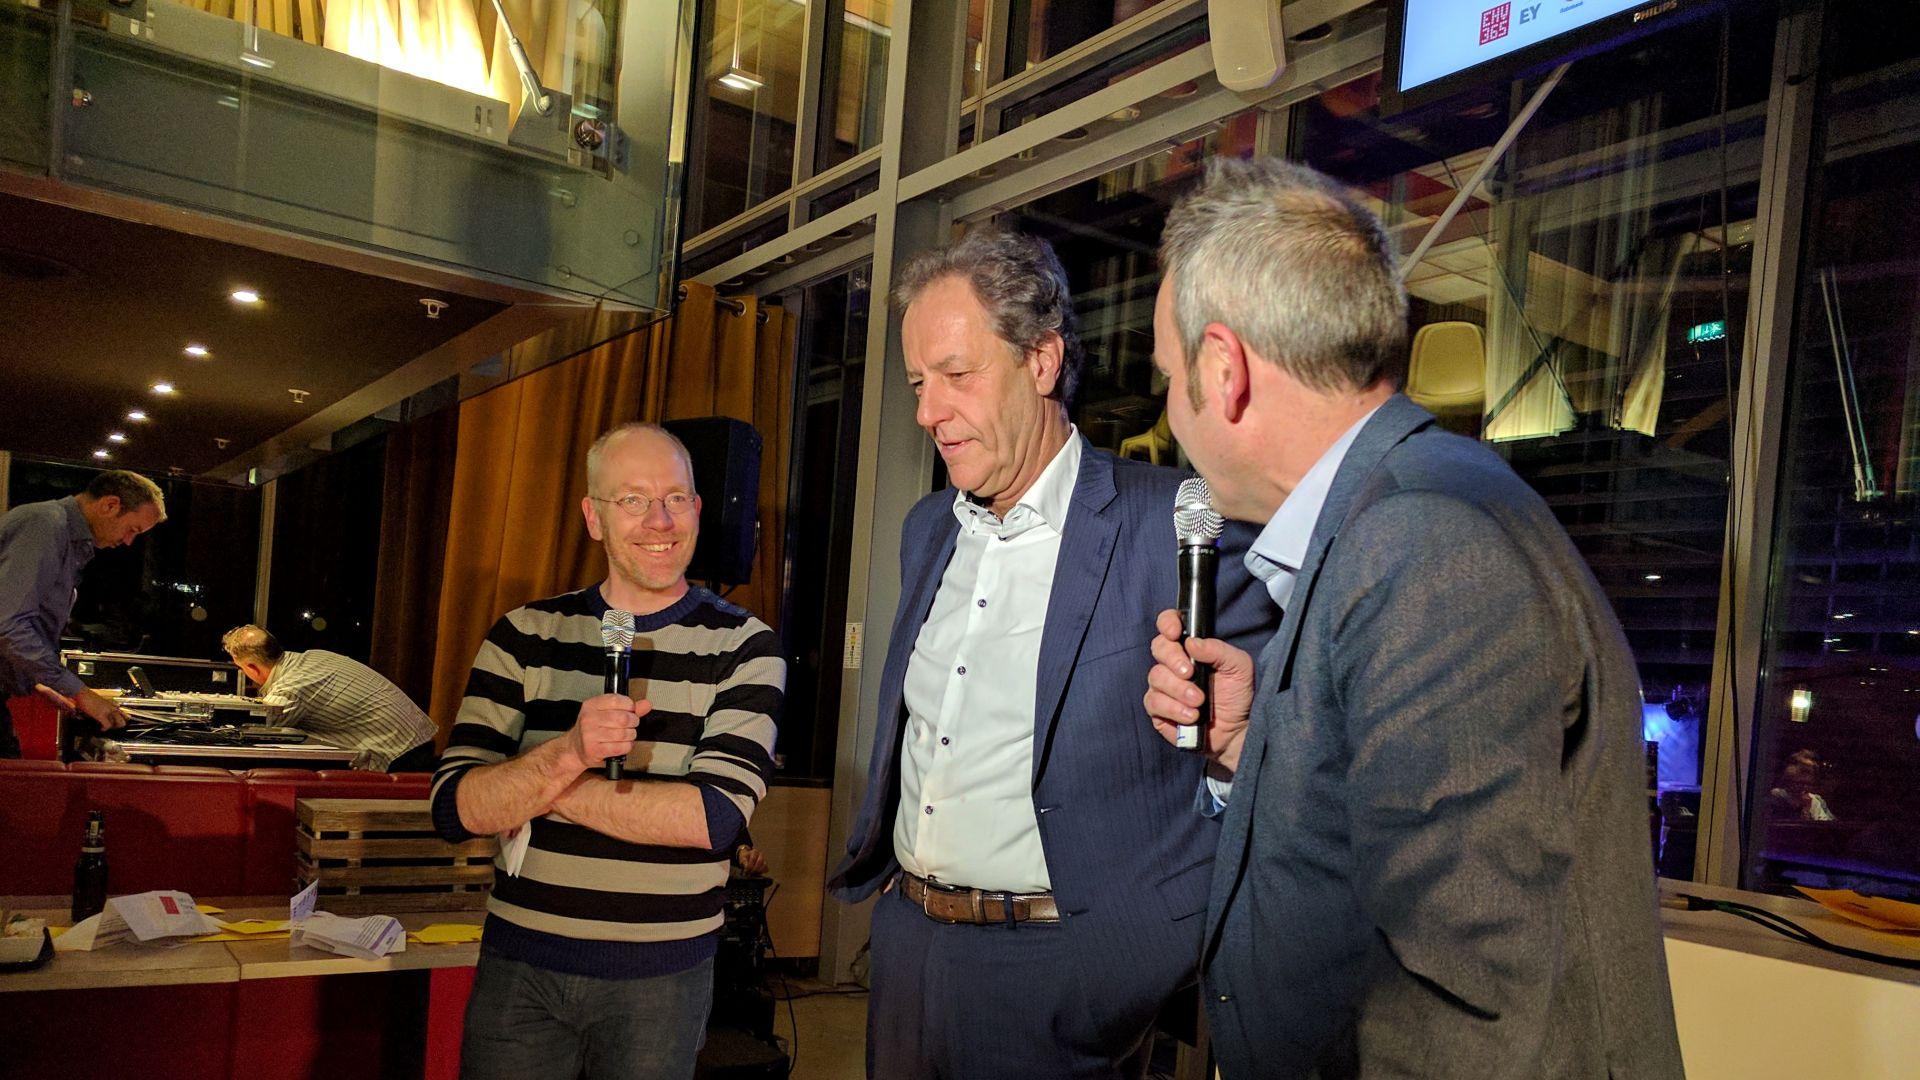 Rob van Gijzel Piek Award High Tech Campus Eindhoven.jpg